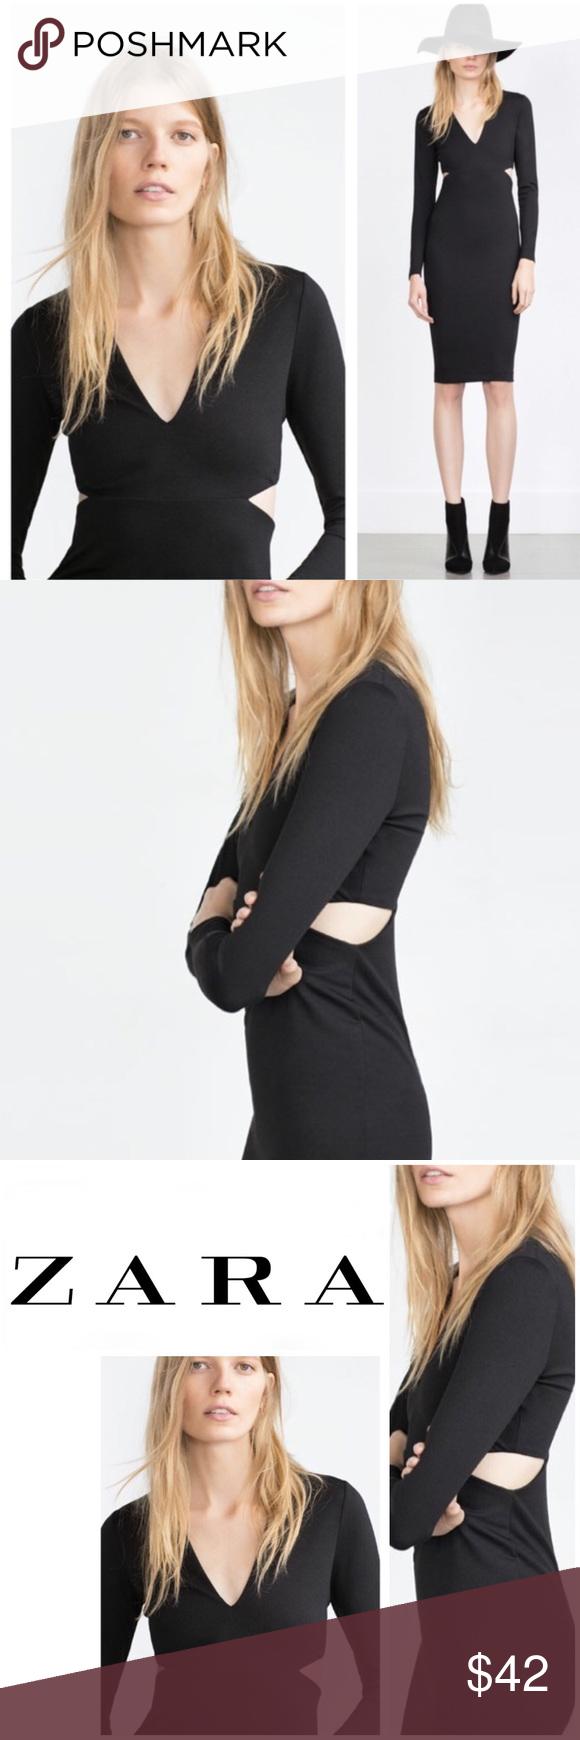 Z a r a black cut out dress in my posh closet pinterest